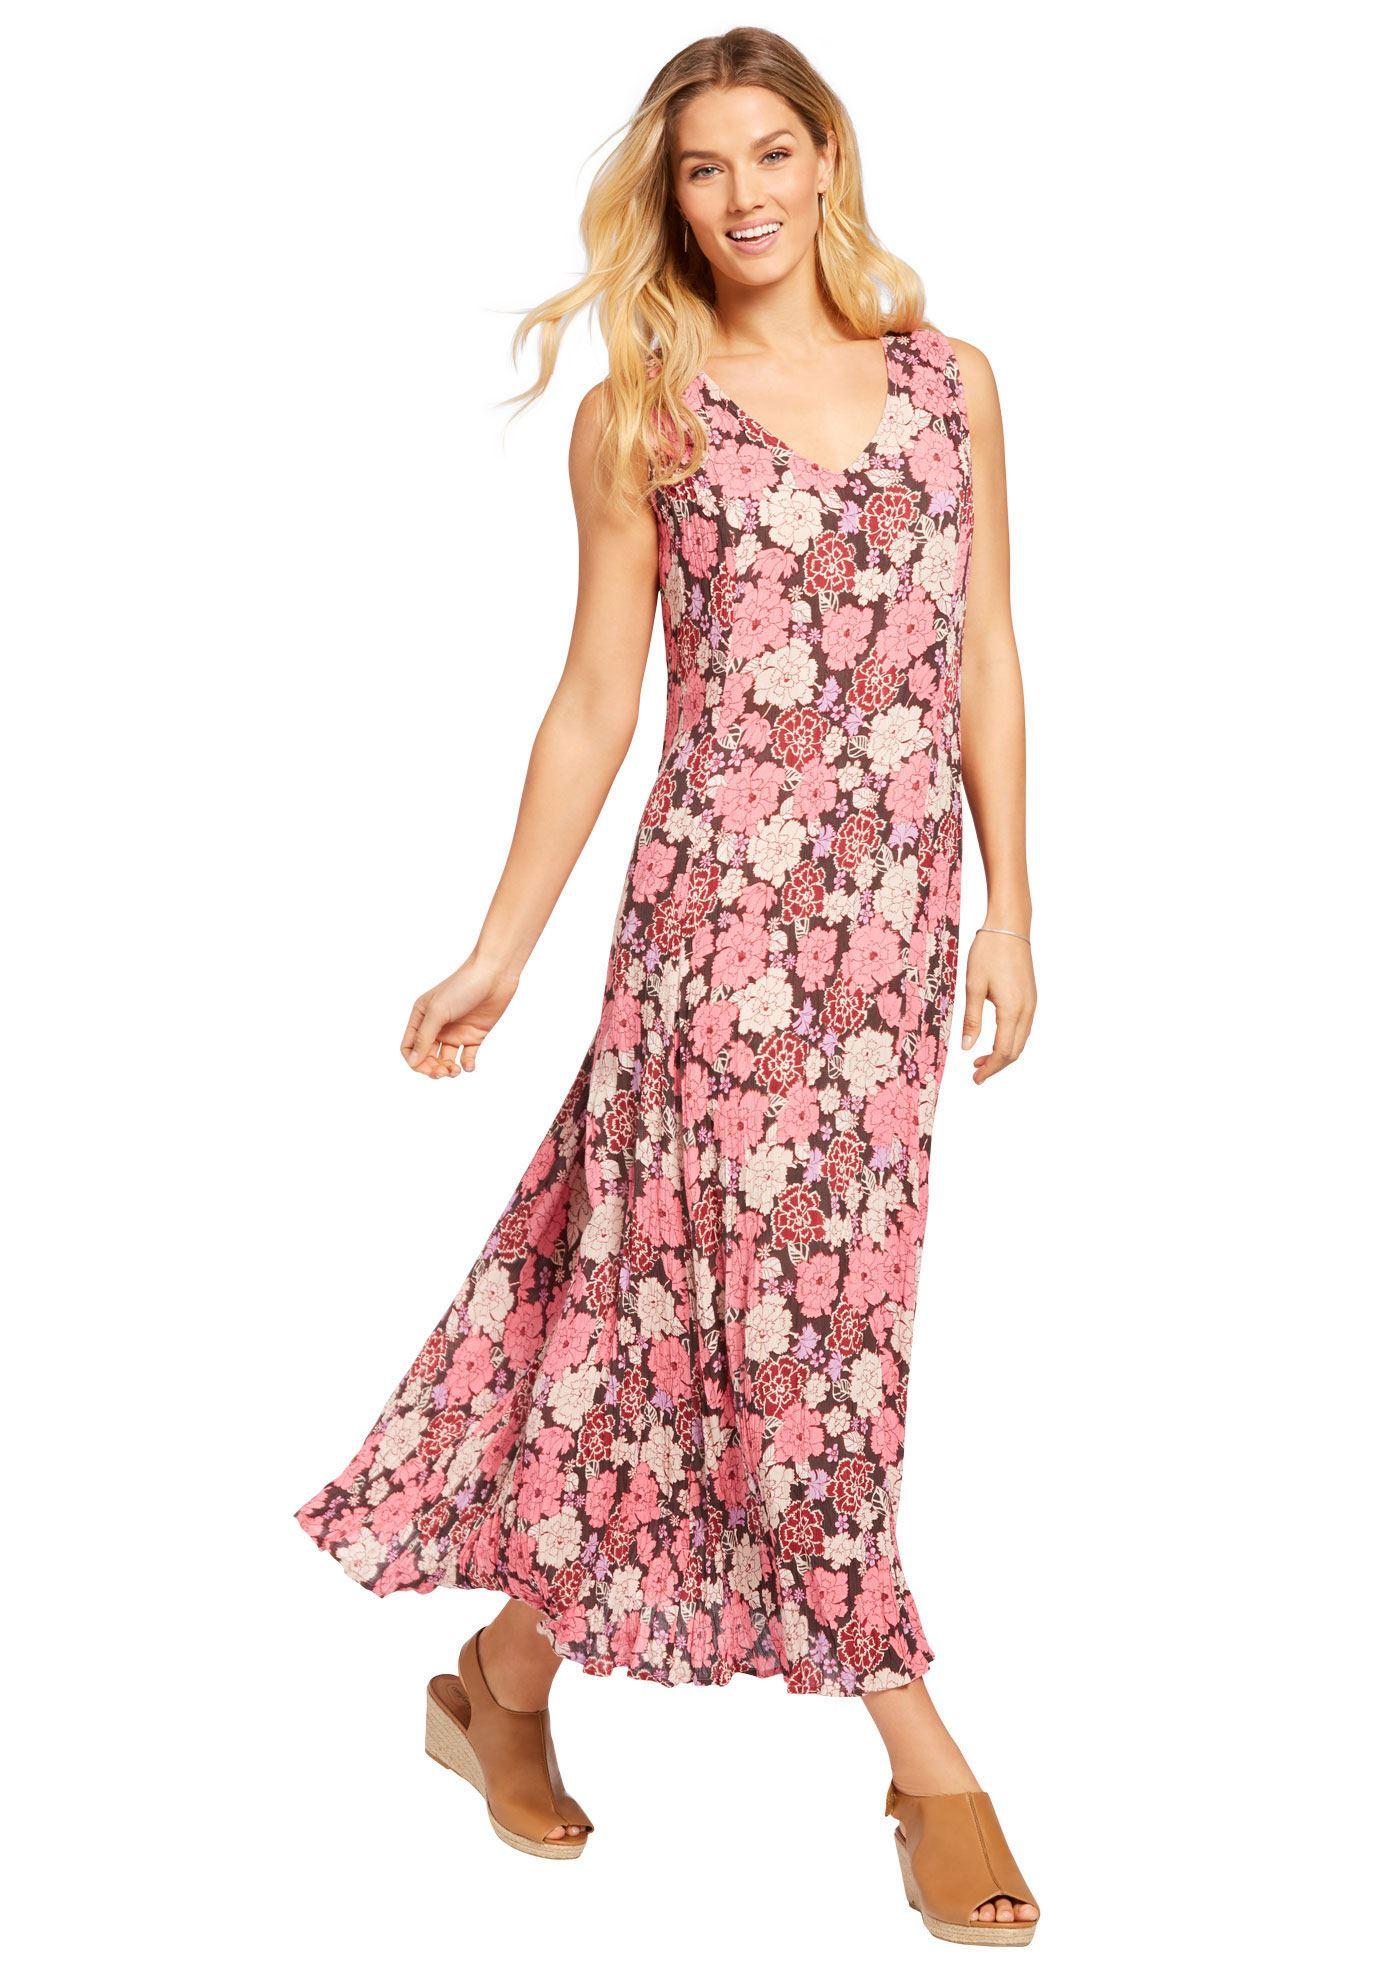 Petite Sleeveless Crinkle Dress - Women\'s Plus Size Clothing